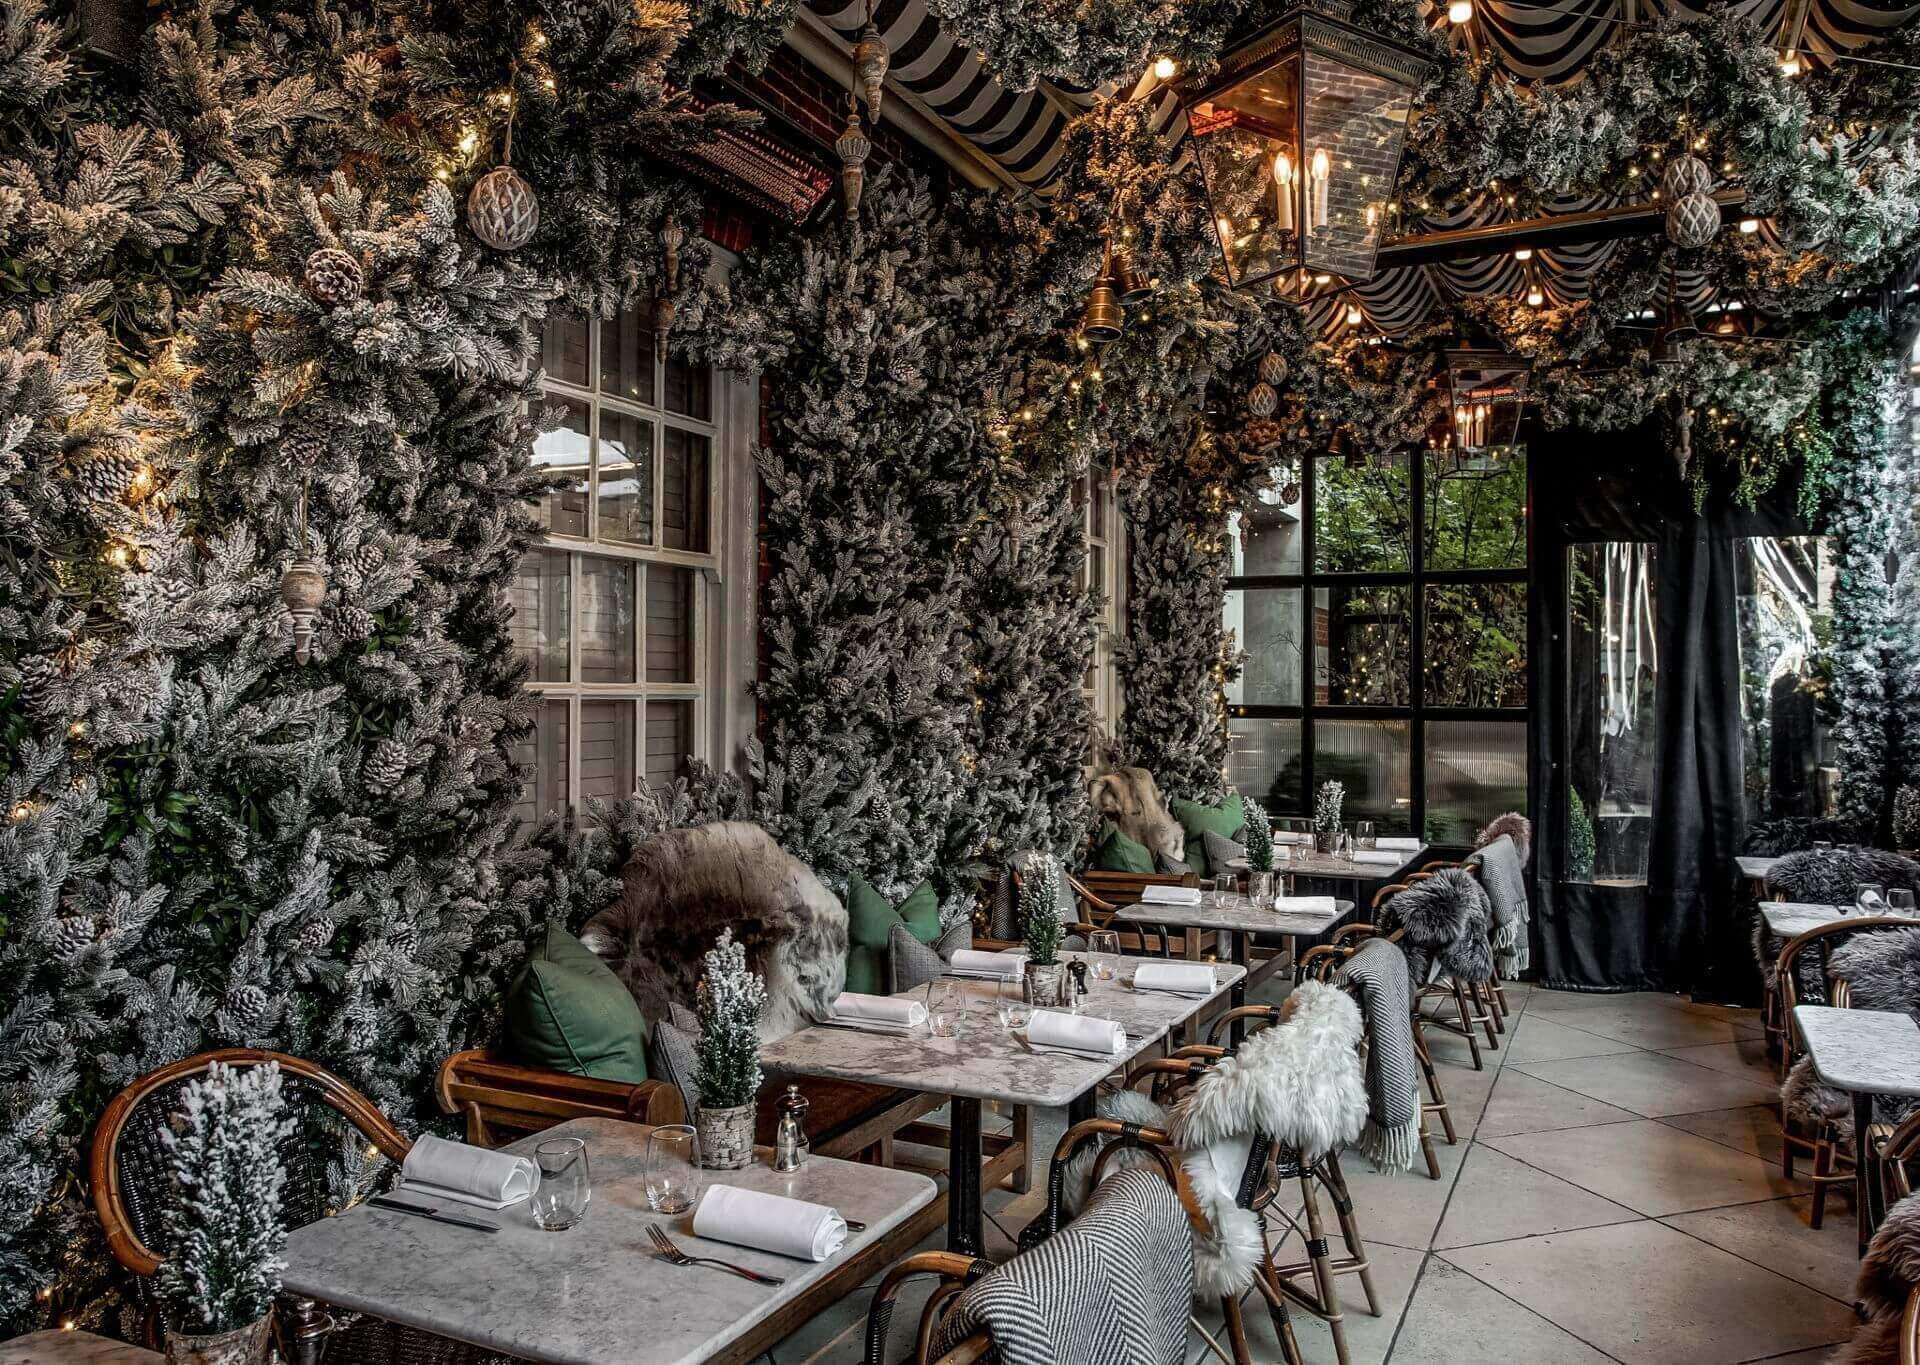 Restaurant and Hotel Interior Design Trends